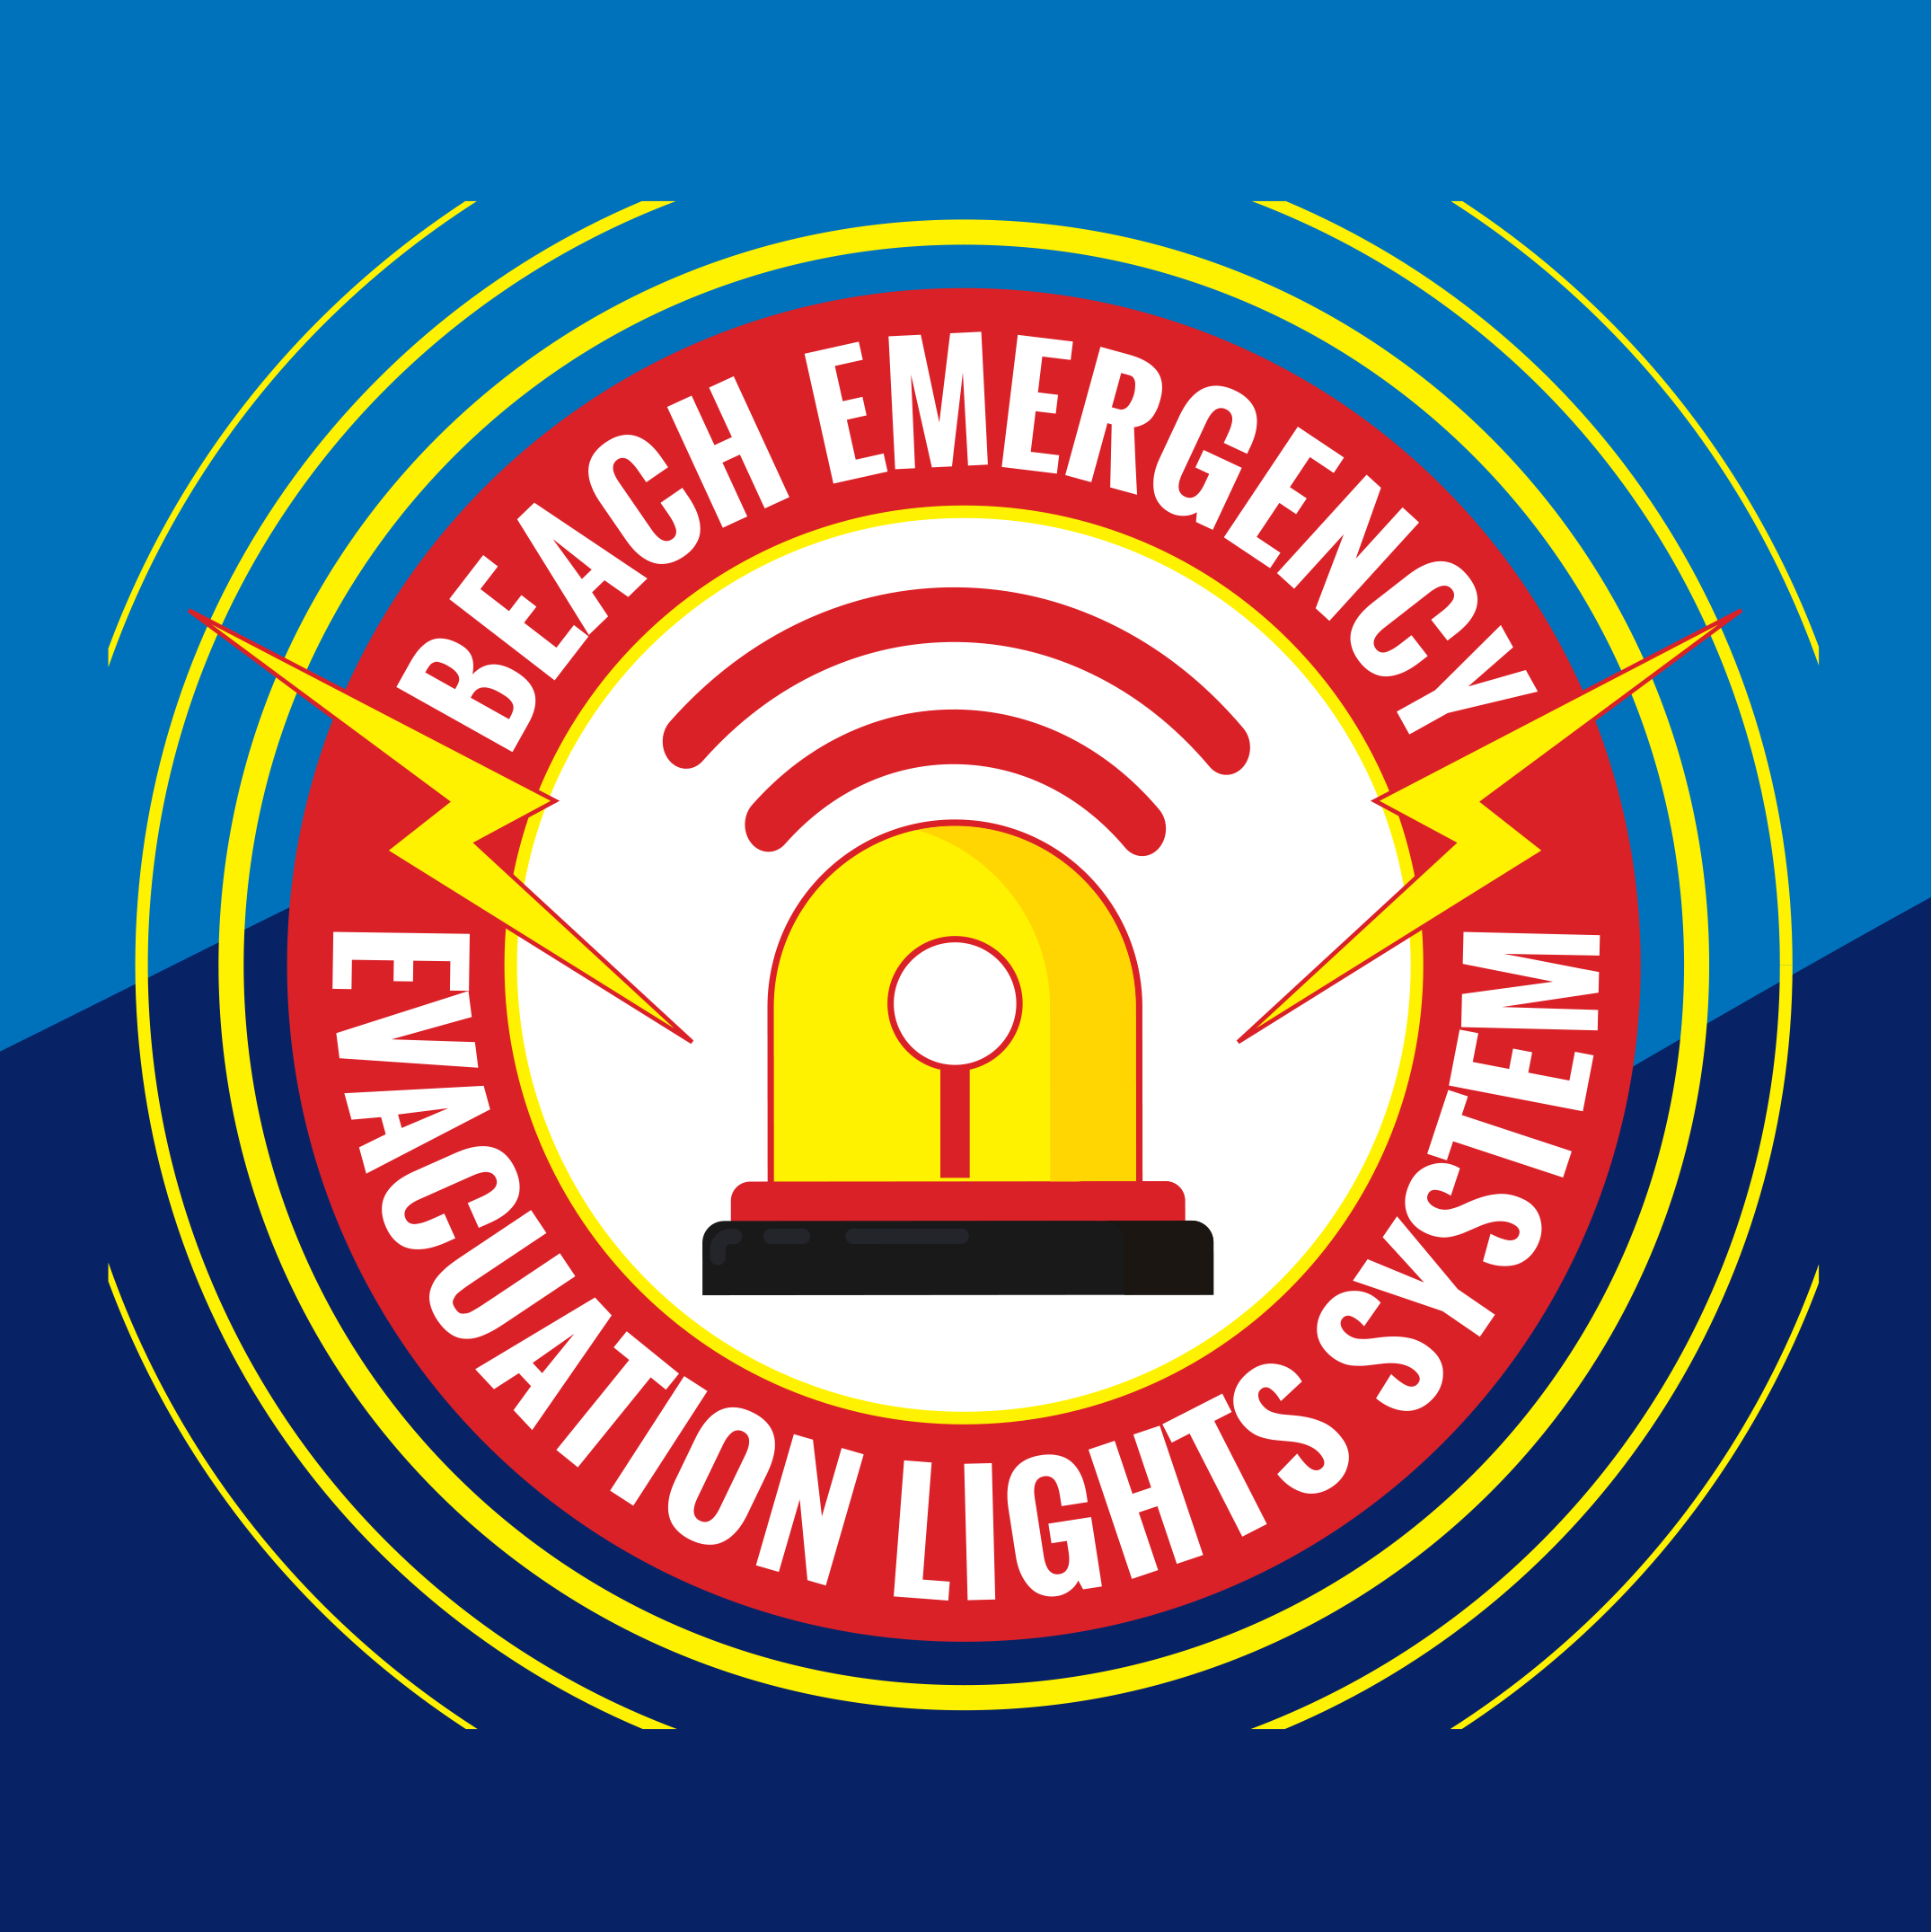 Logo for Beach Emergency Evacuation Lights System